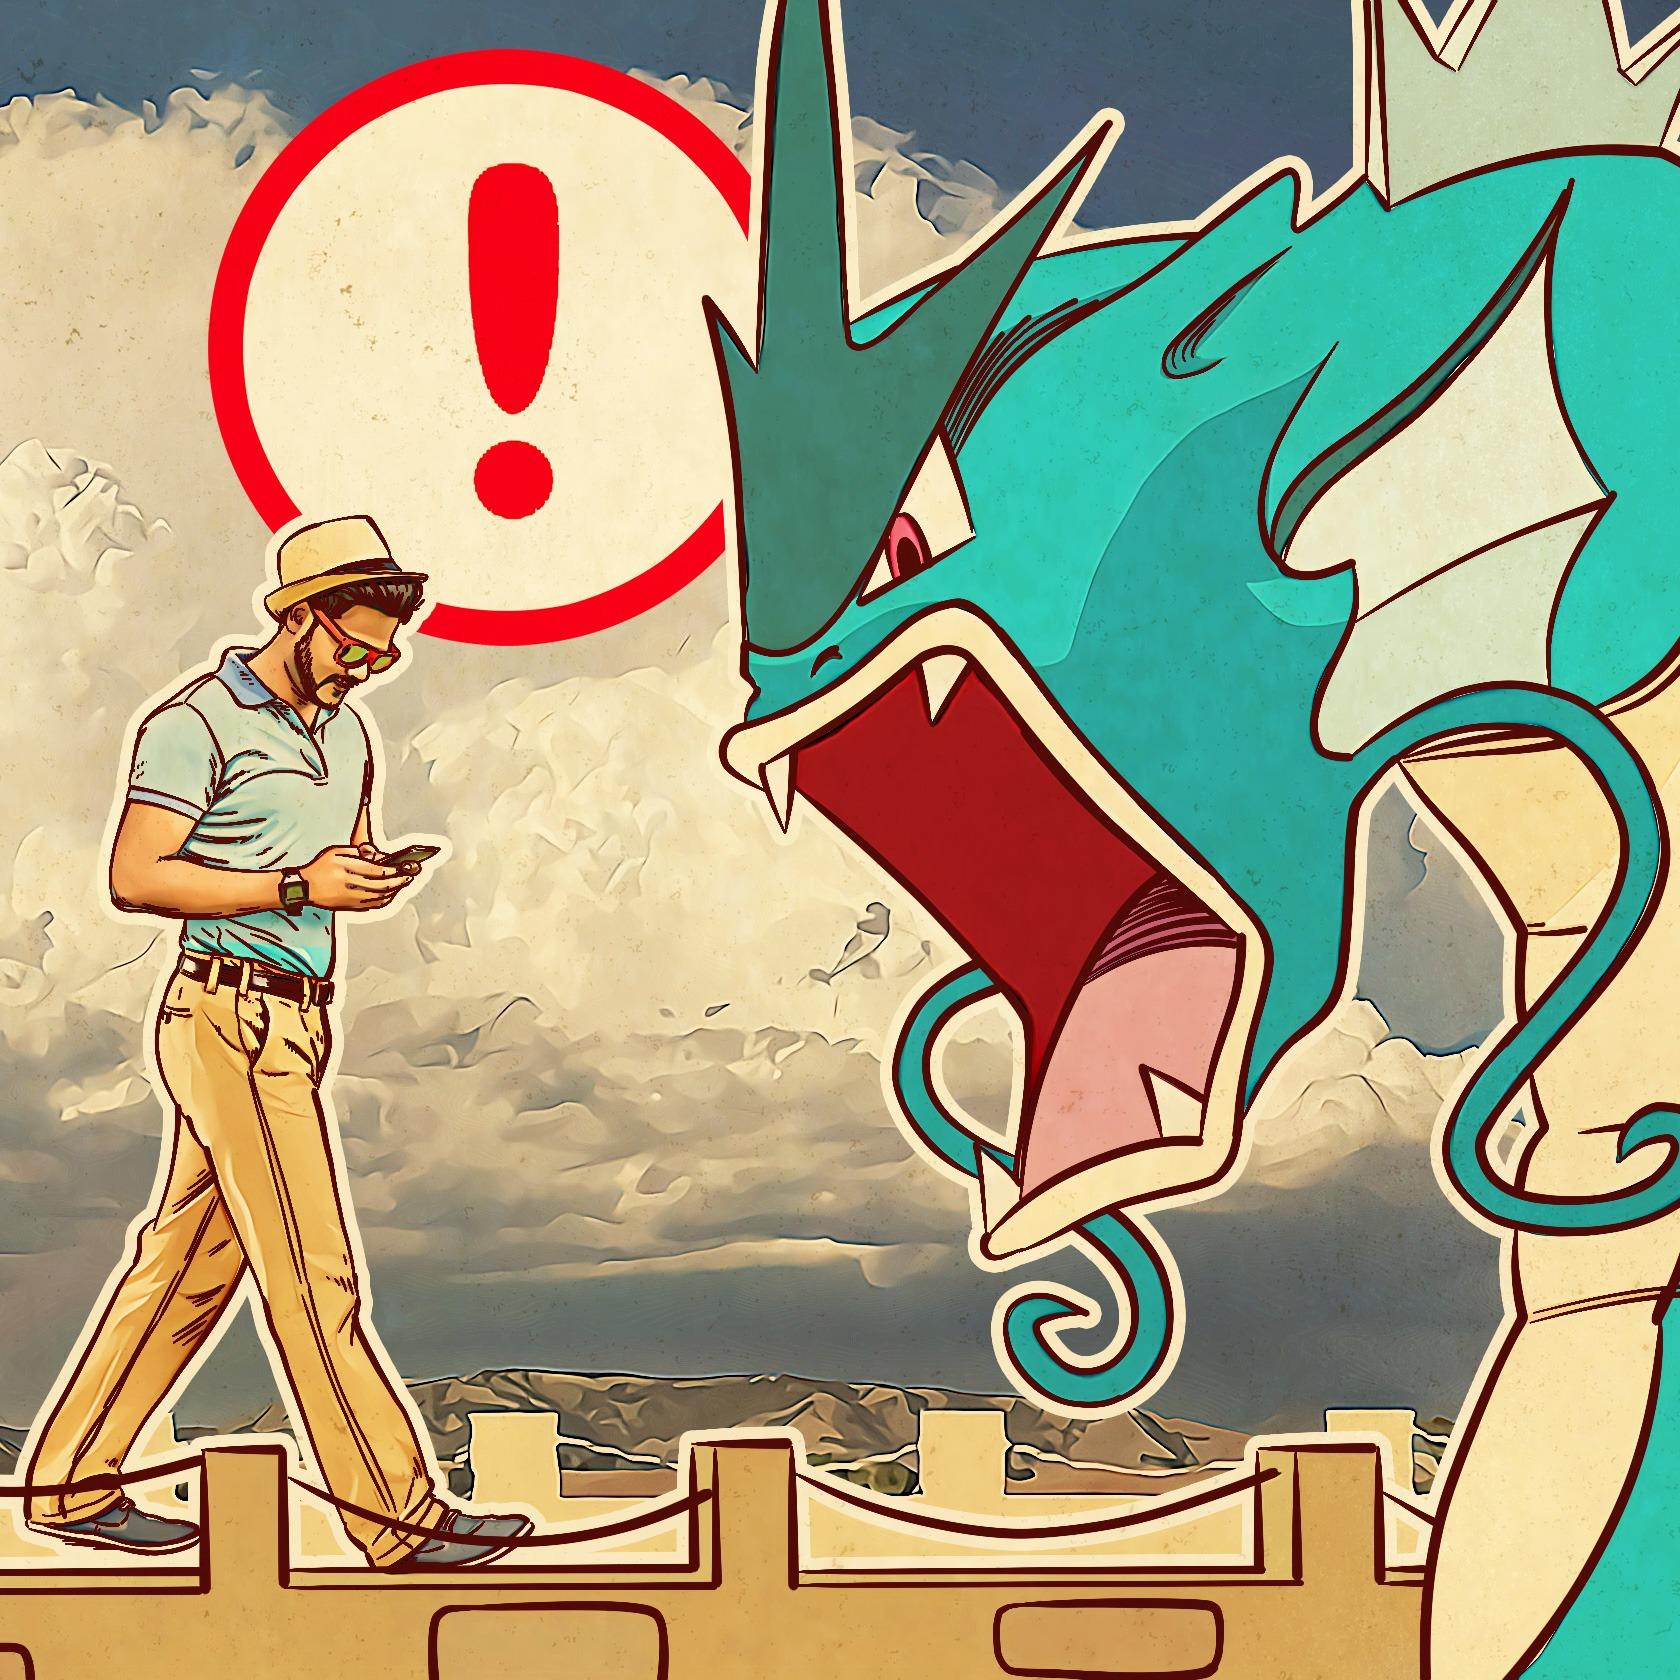 Addicted to Pokémon Go? Criminals know